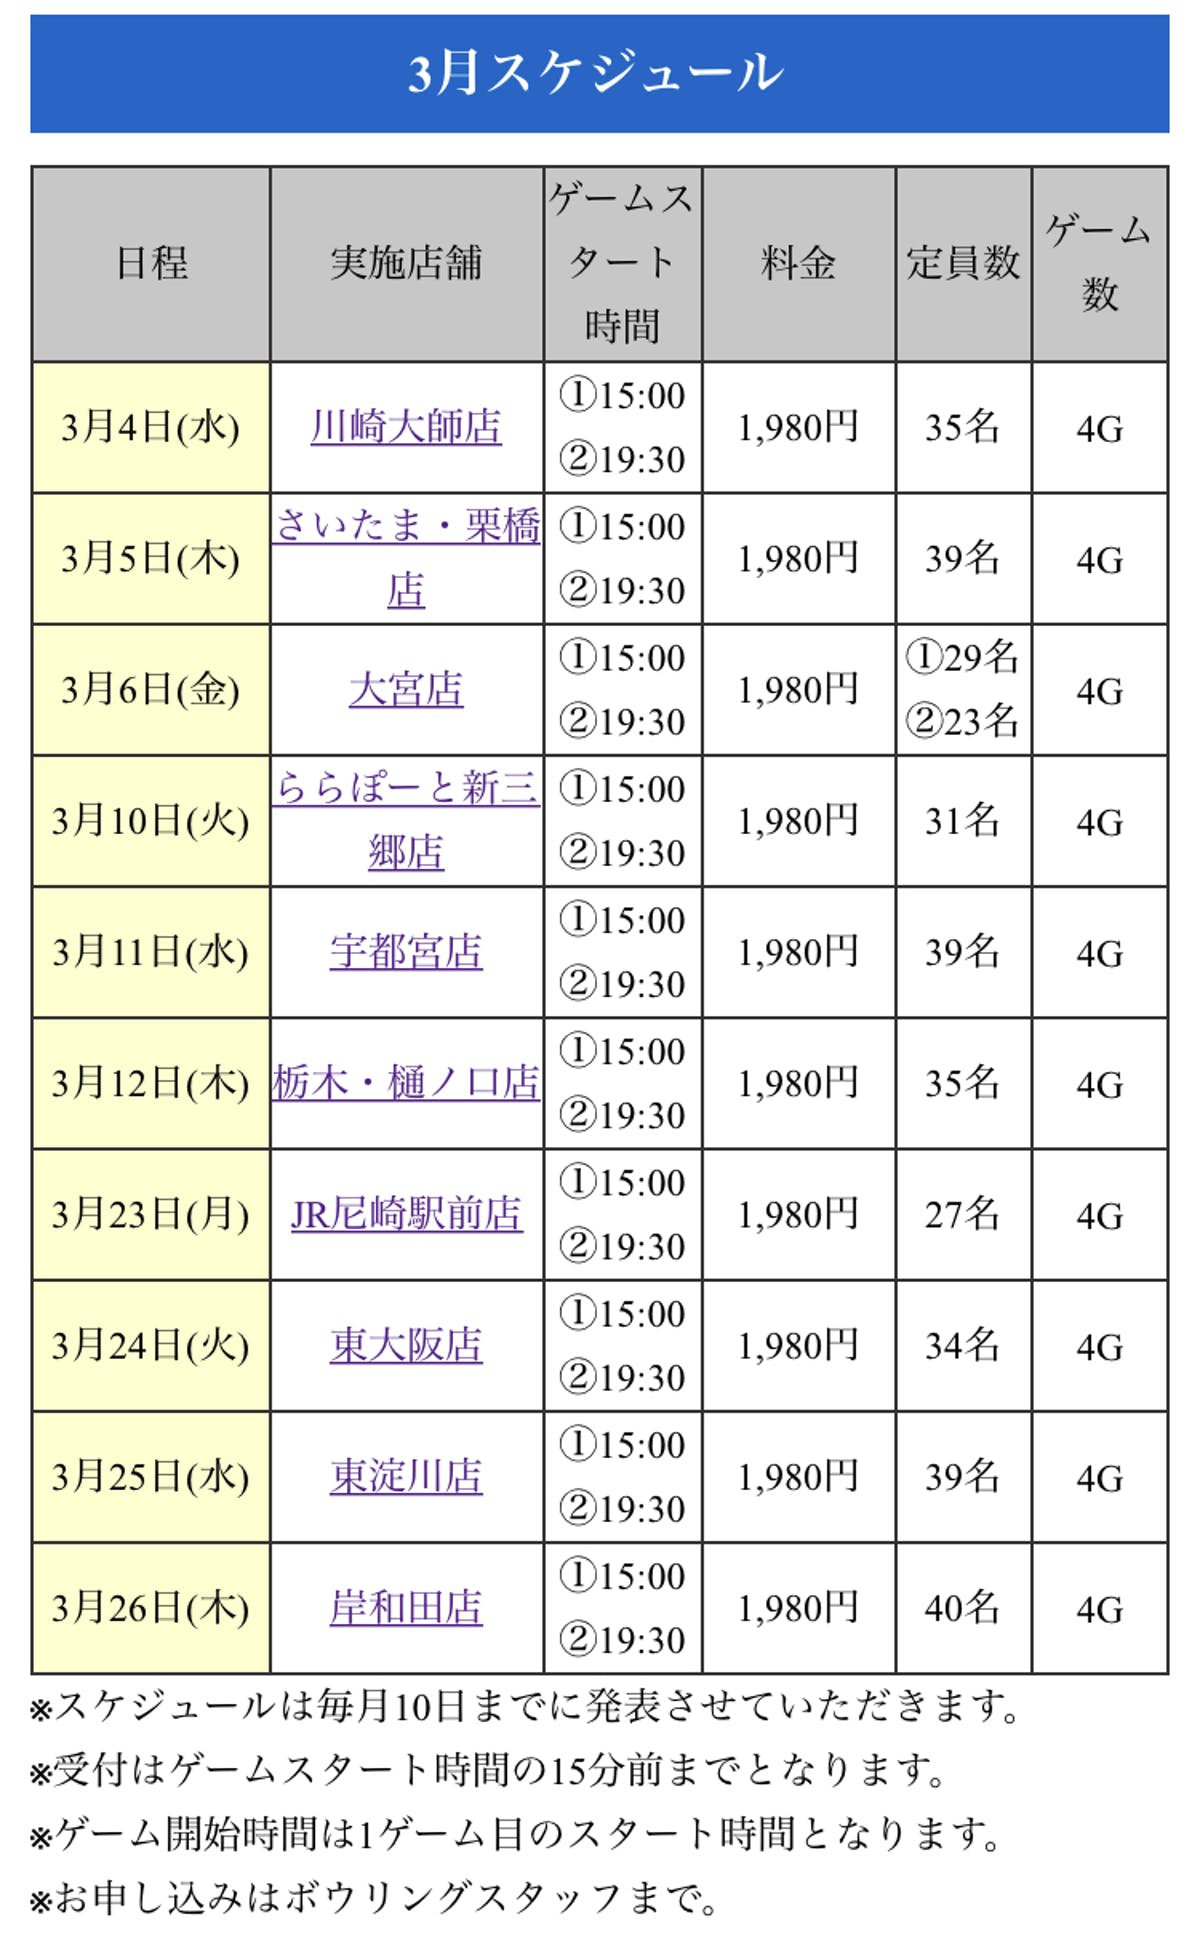 782AE95C-AEE0-454C-978B-4C17E30C8A7B.jpeg